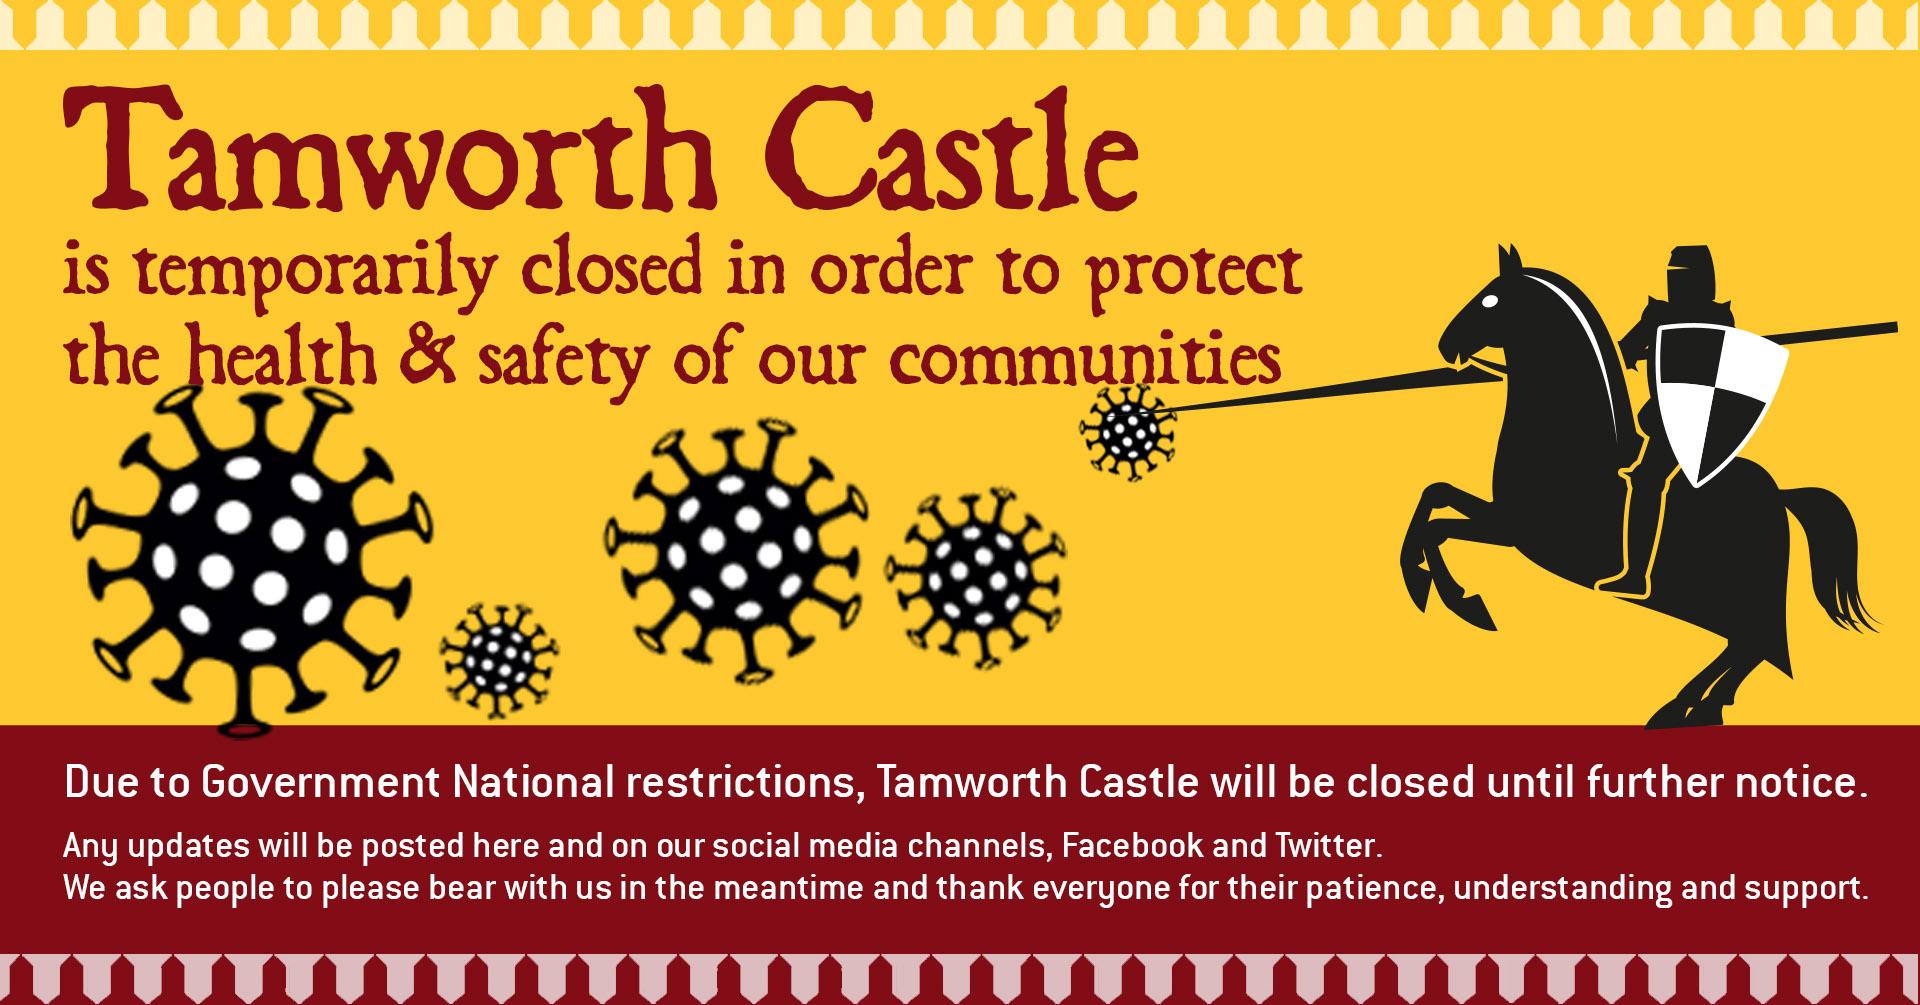 Castle closed due to Covid